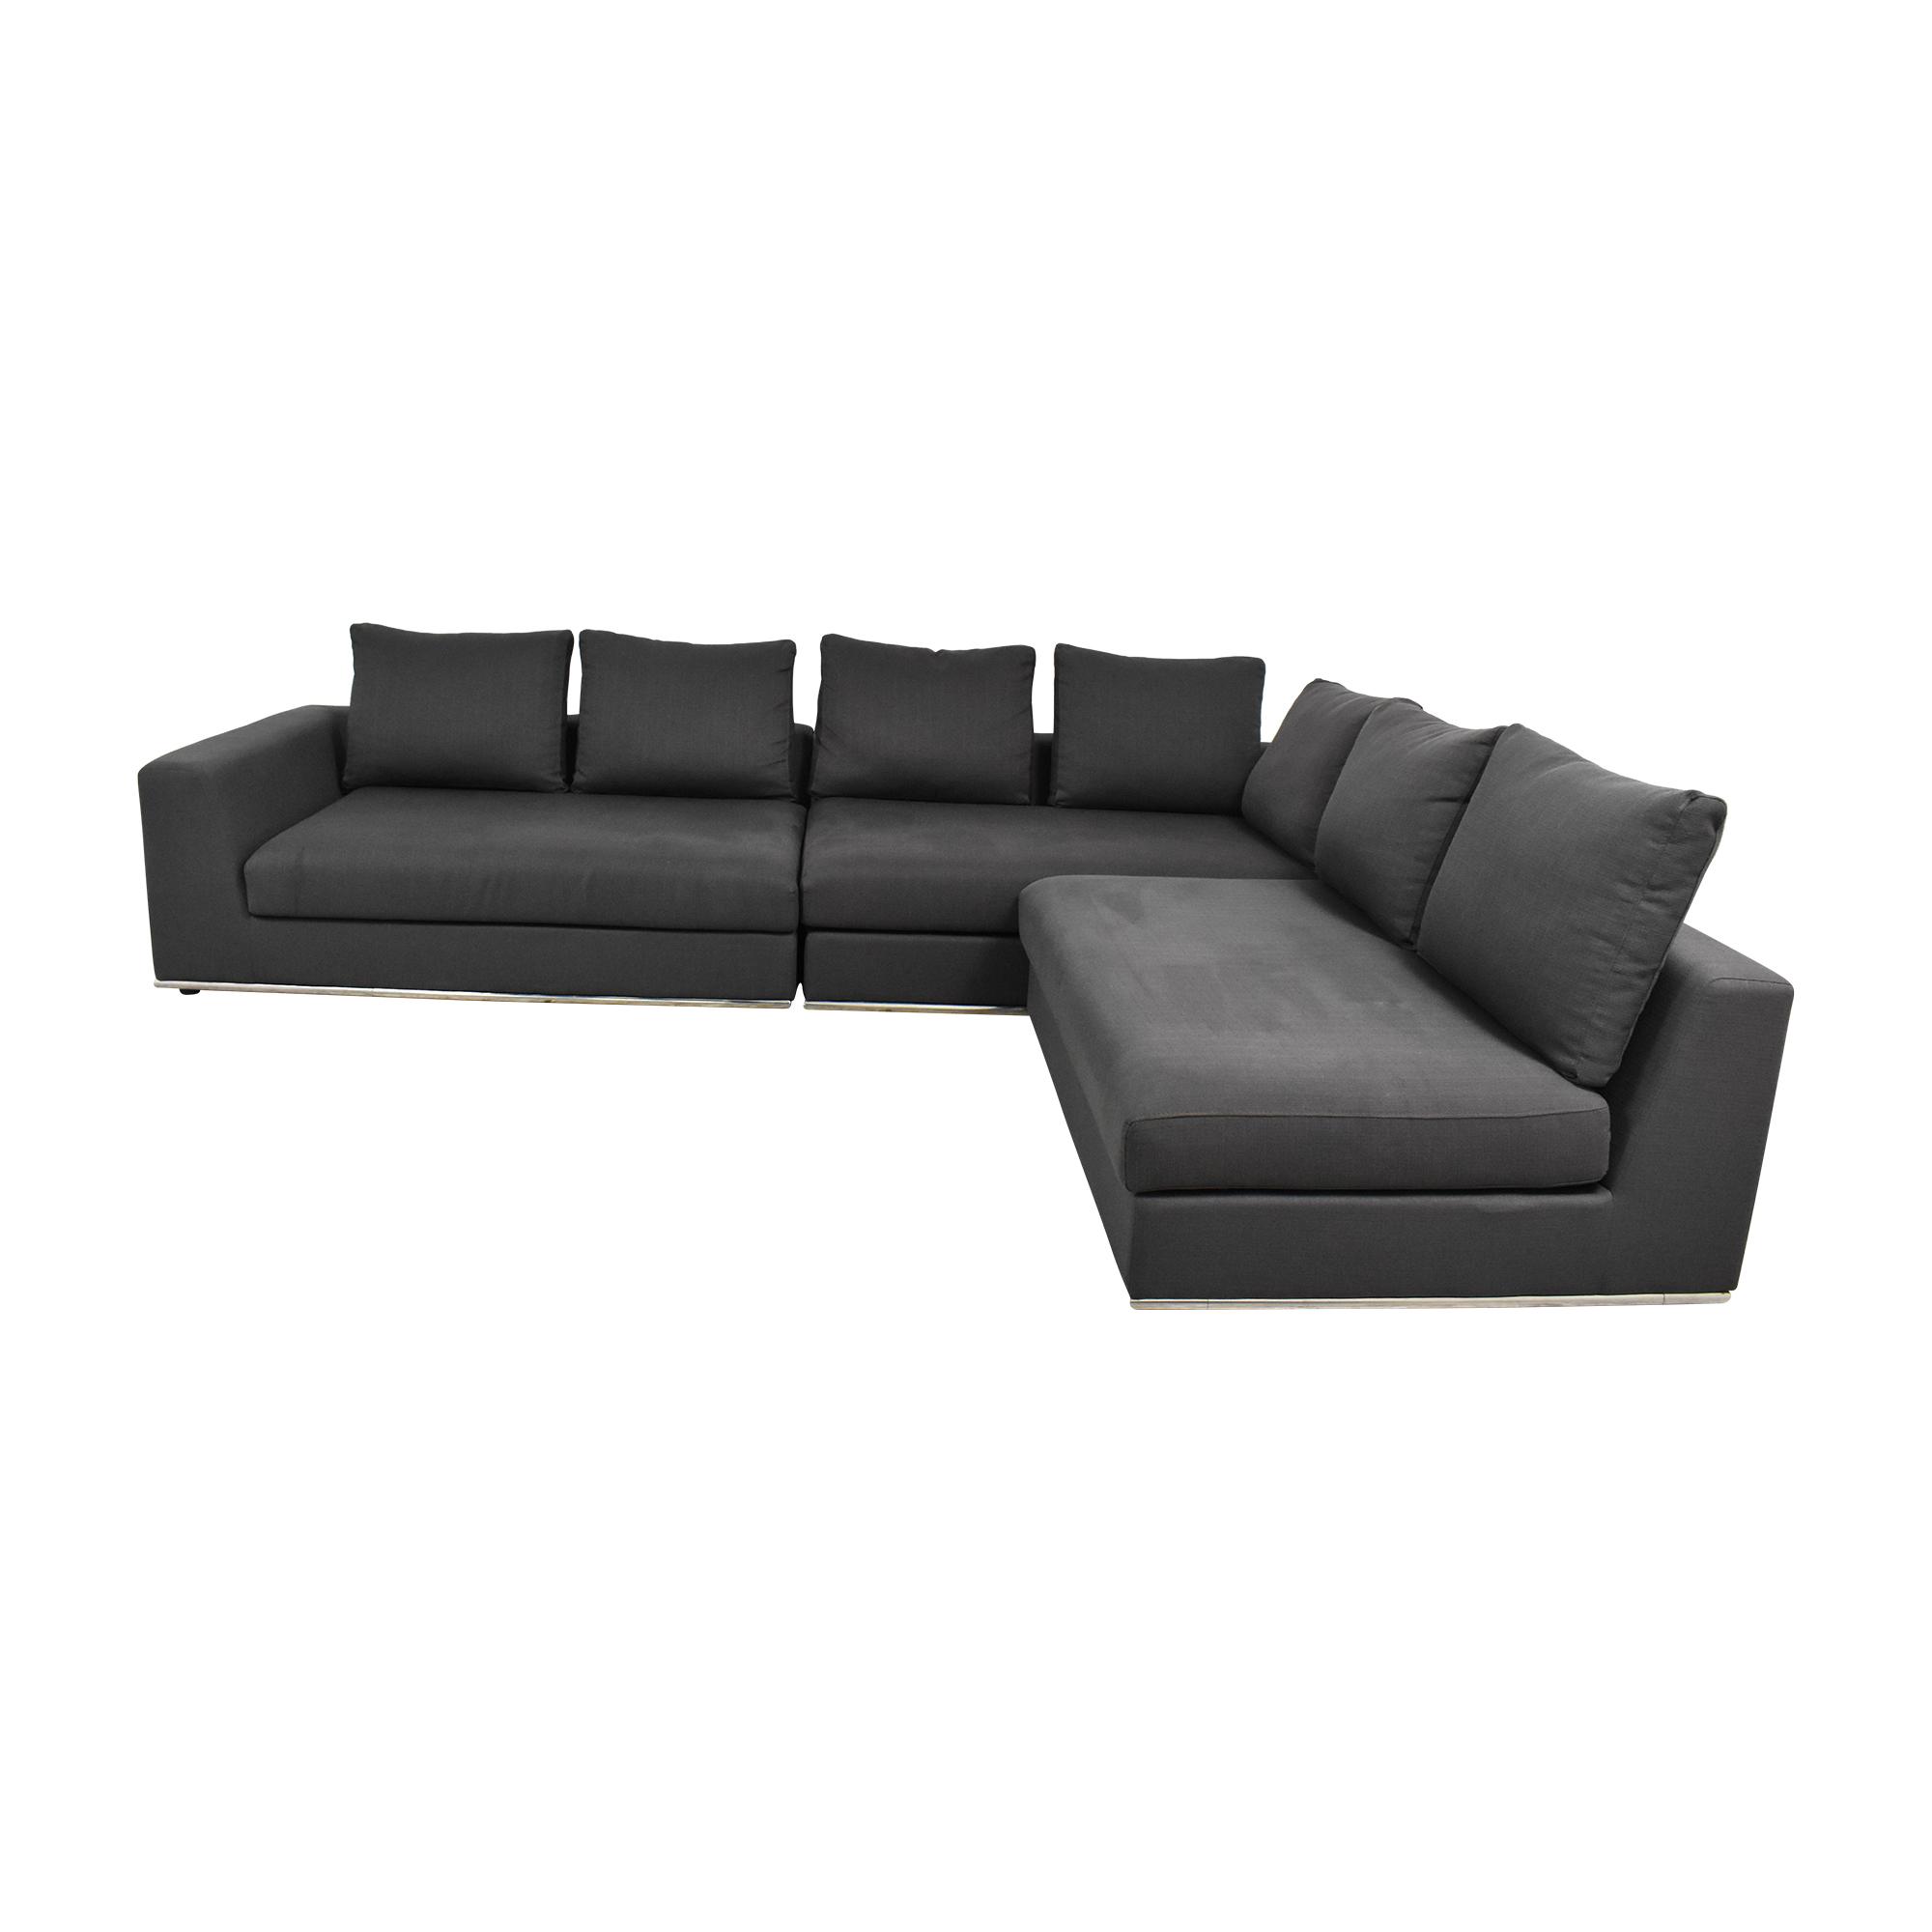 Modani Modani Giovani Three Piece Sectional Sofa price